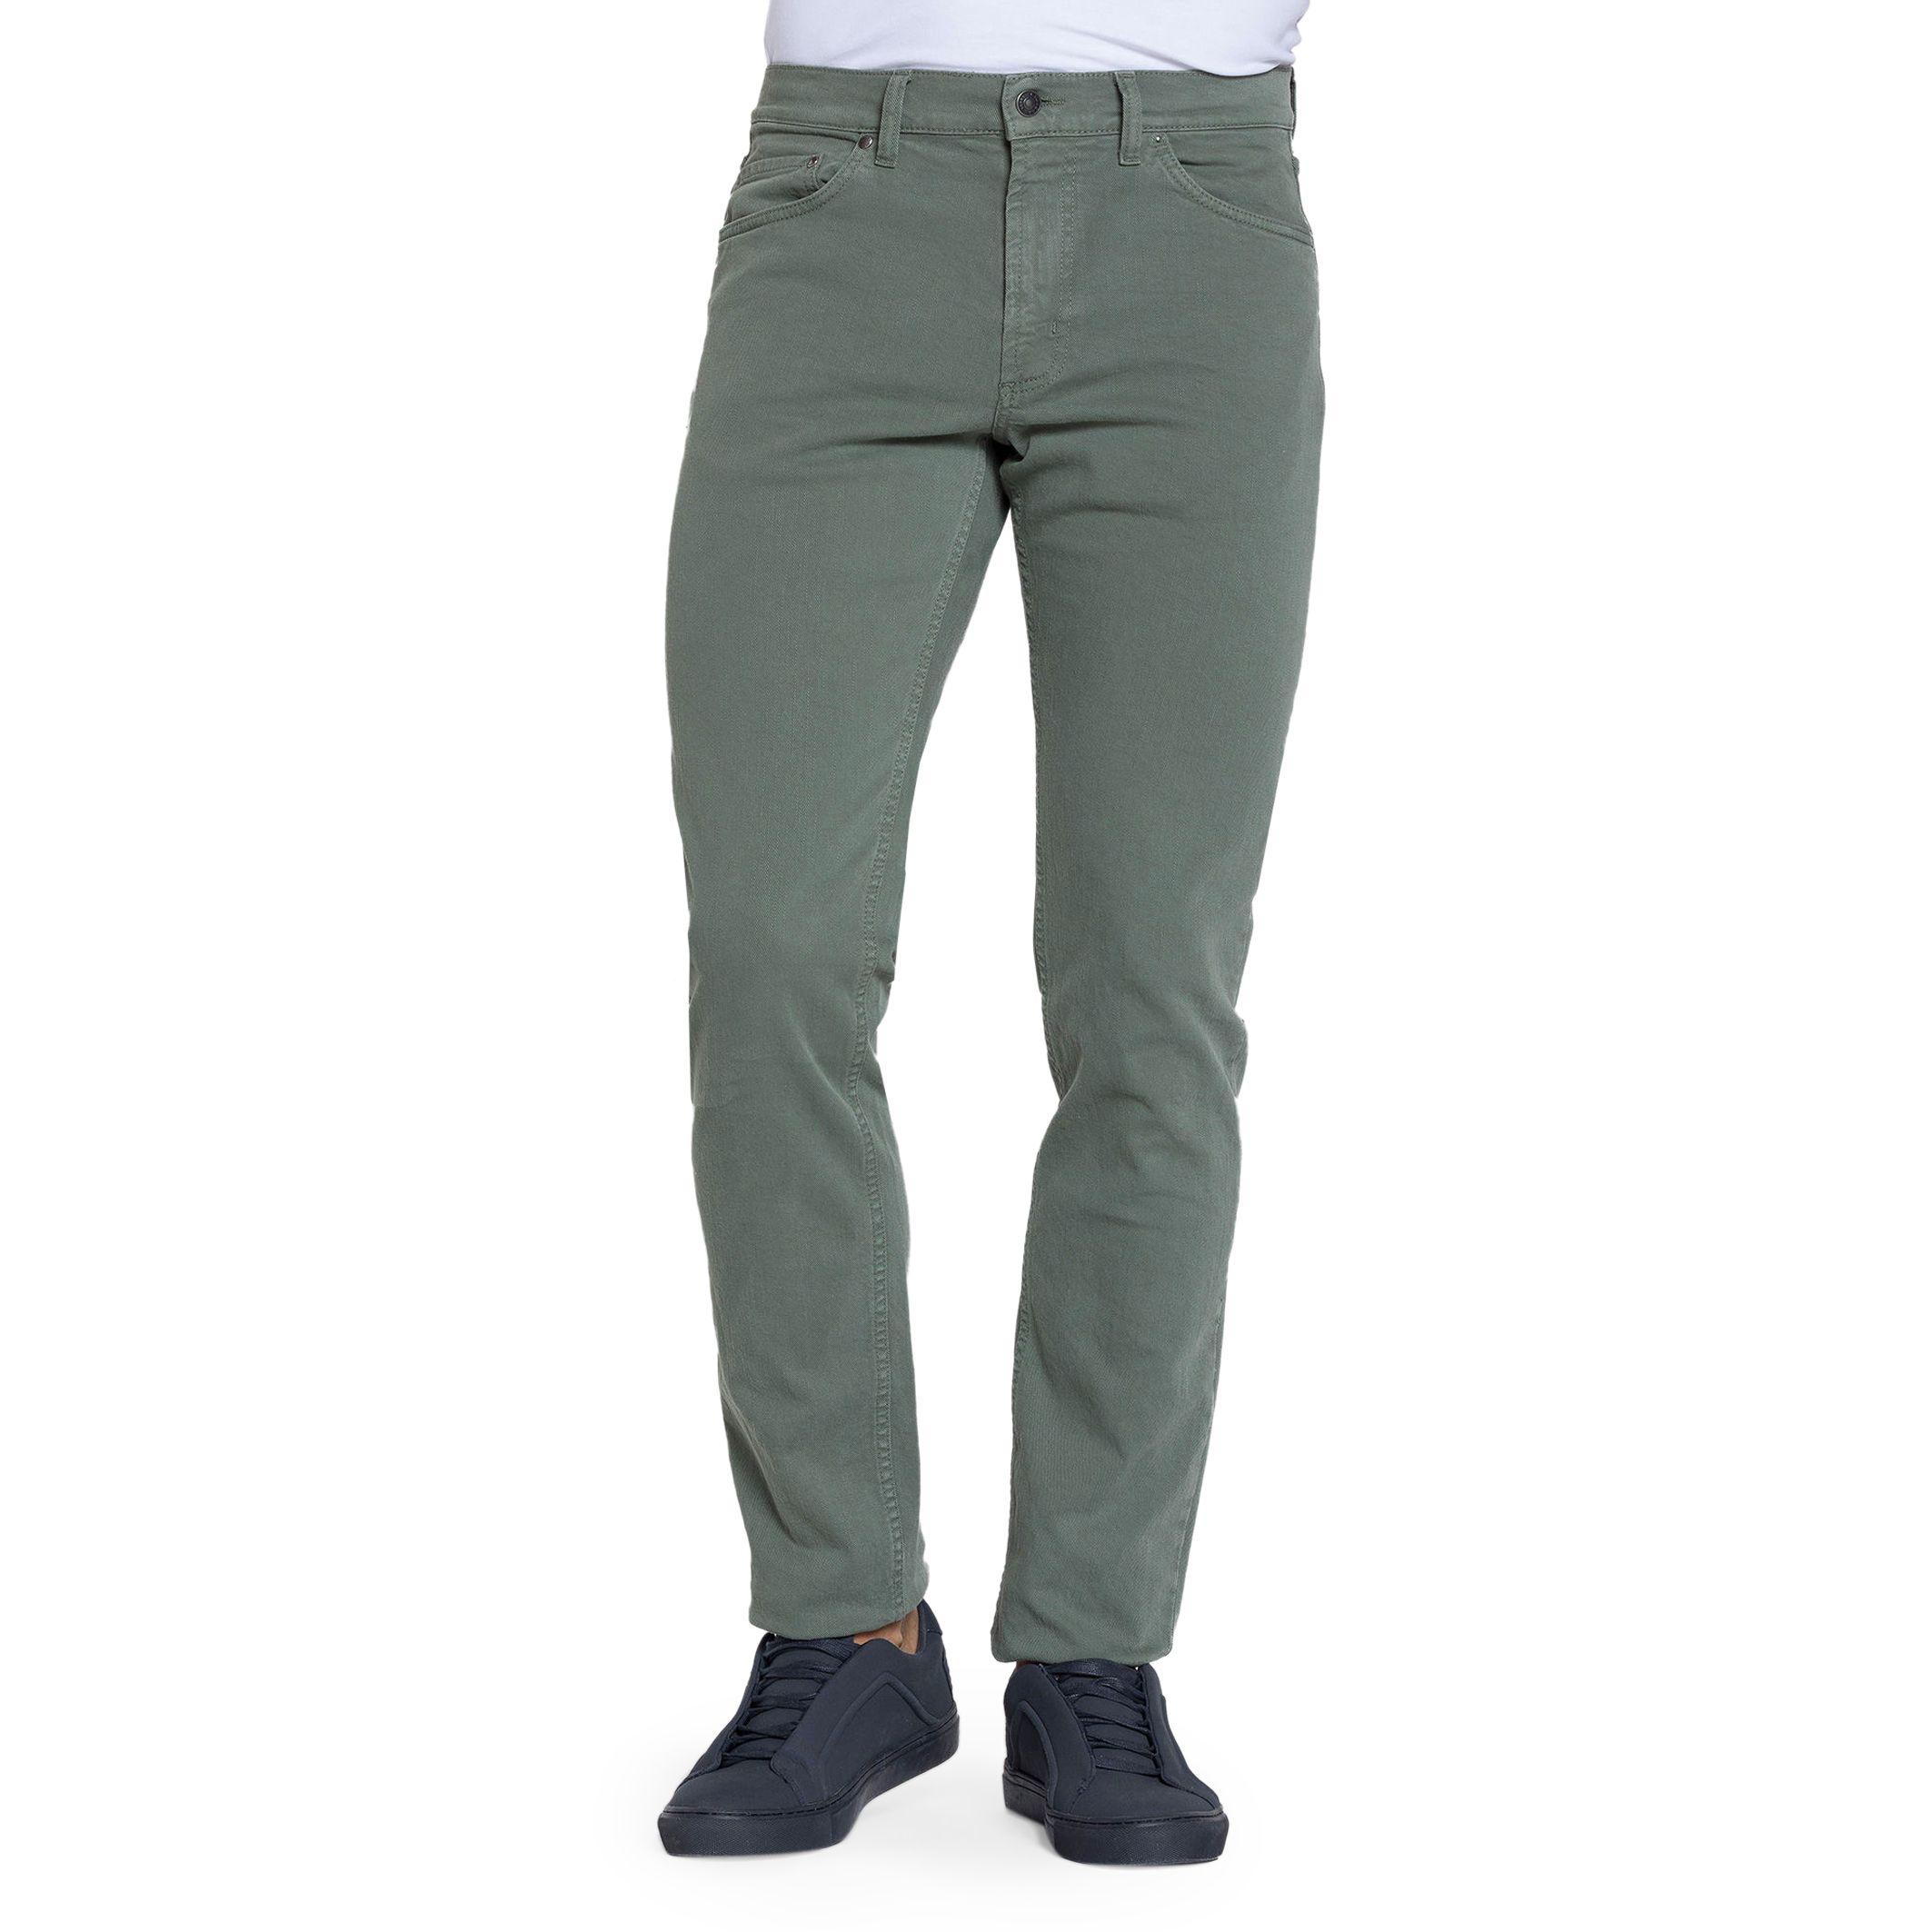 Carrera Jeans – 700_9302A